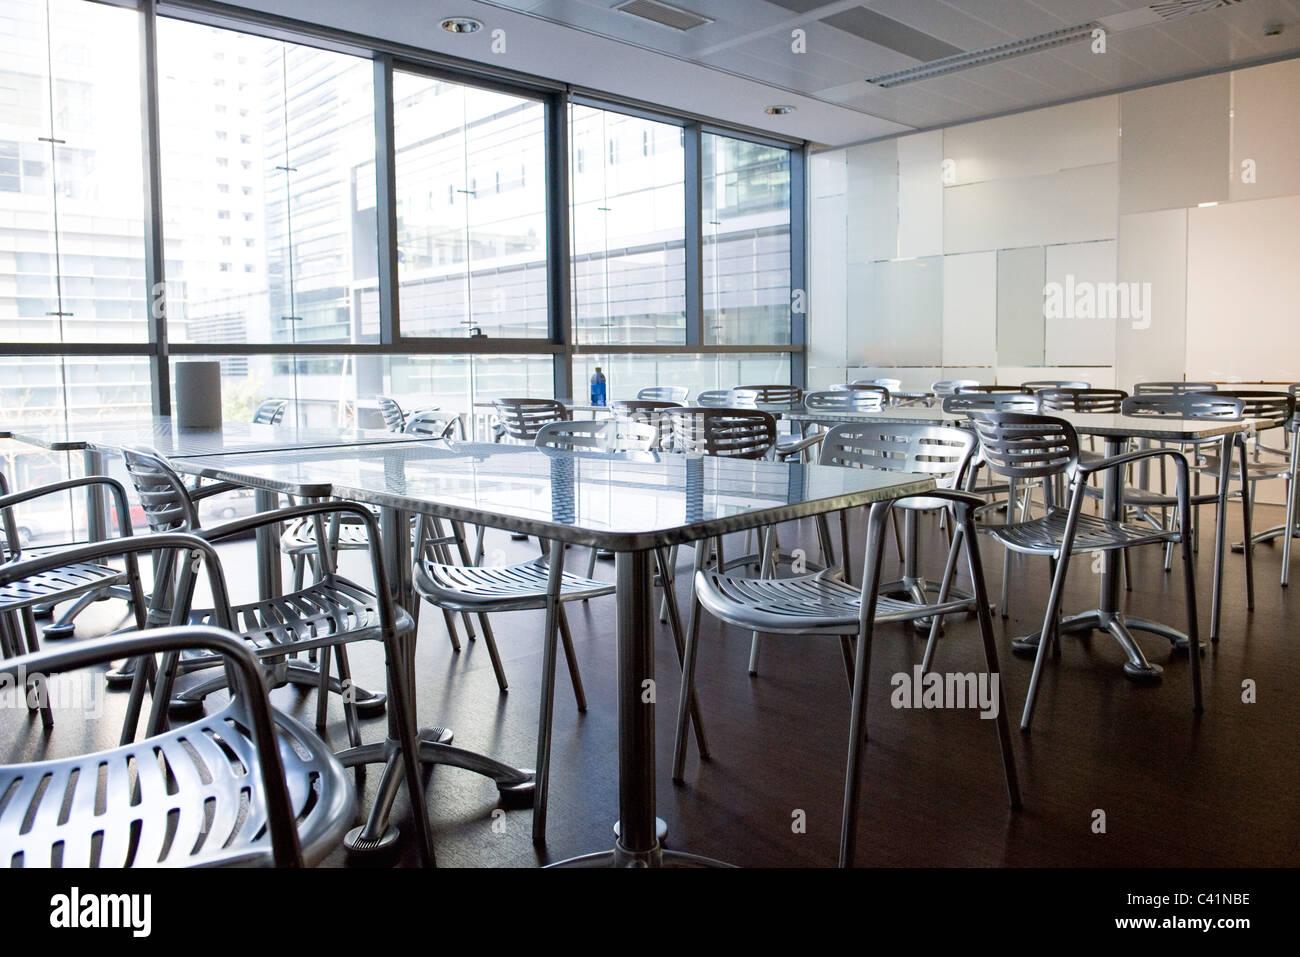 Empty cafeteria - Stock Image